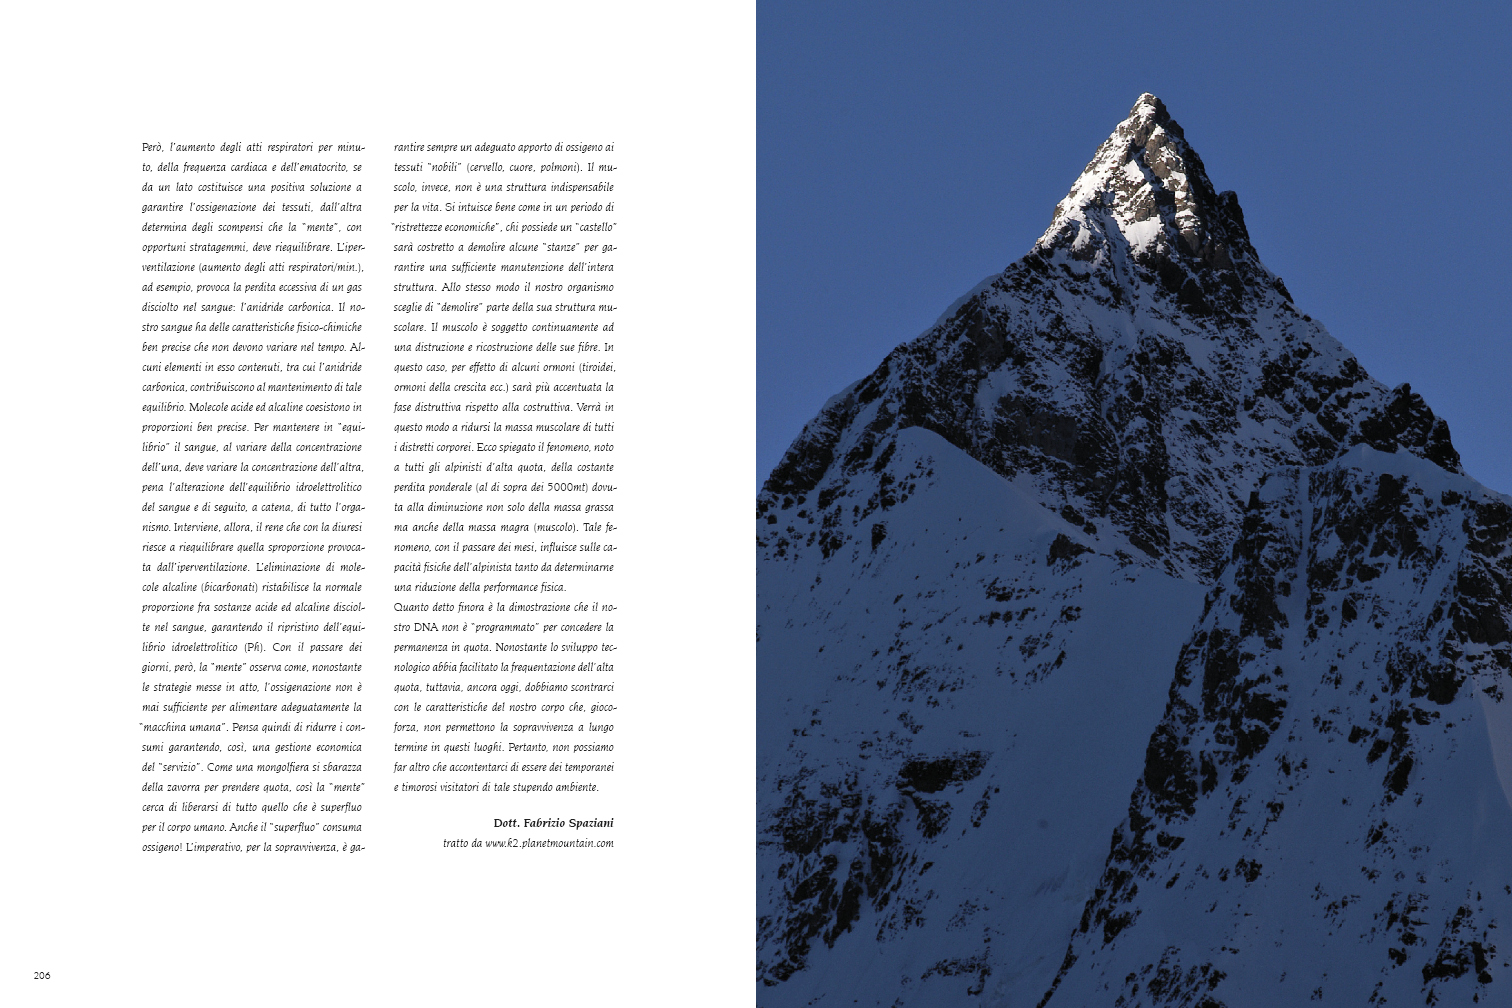 K2 EXPEDITION 1954-2004 Giuseppe Ghedina Fotografo - 105.jpg